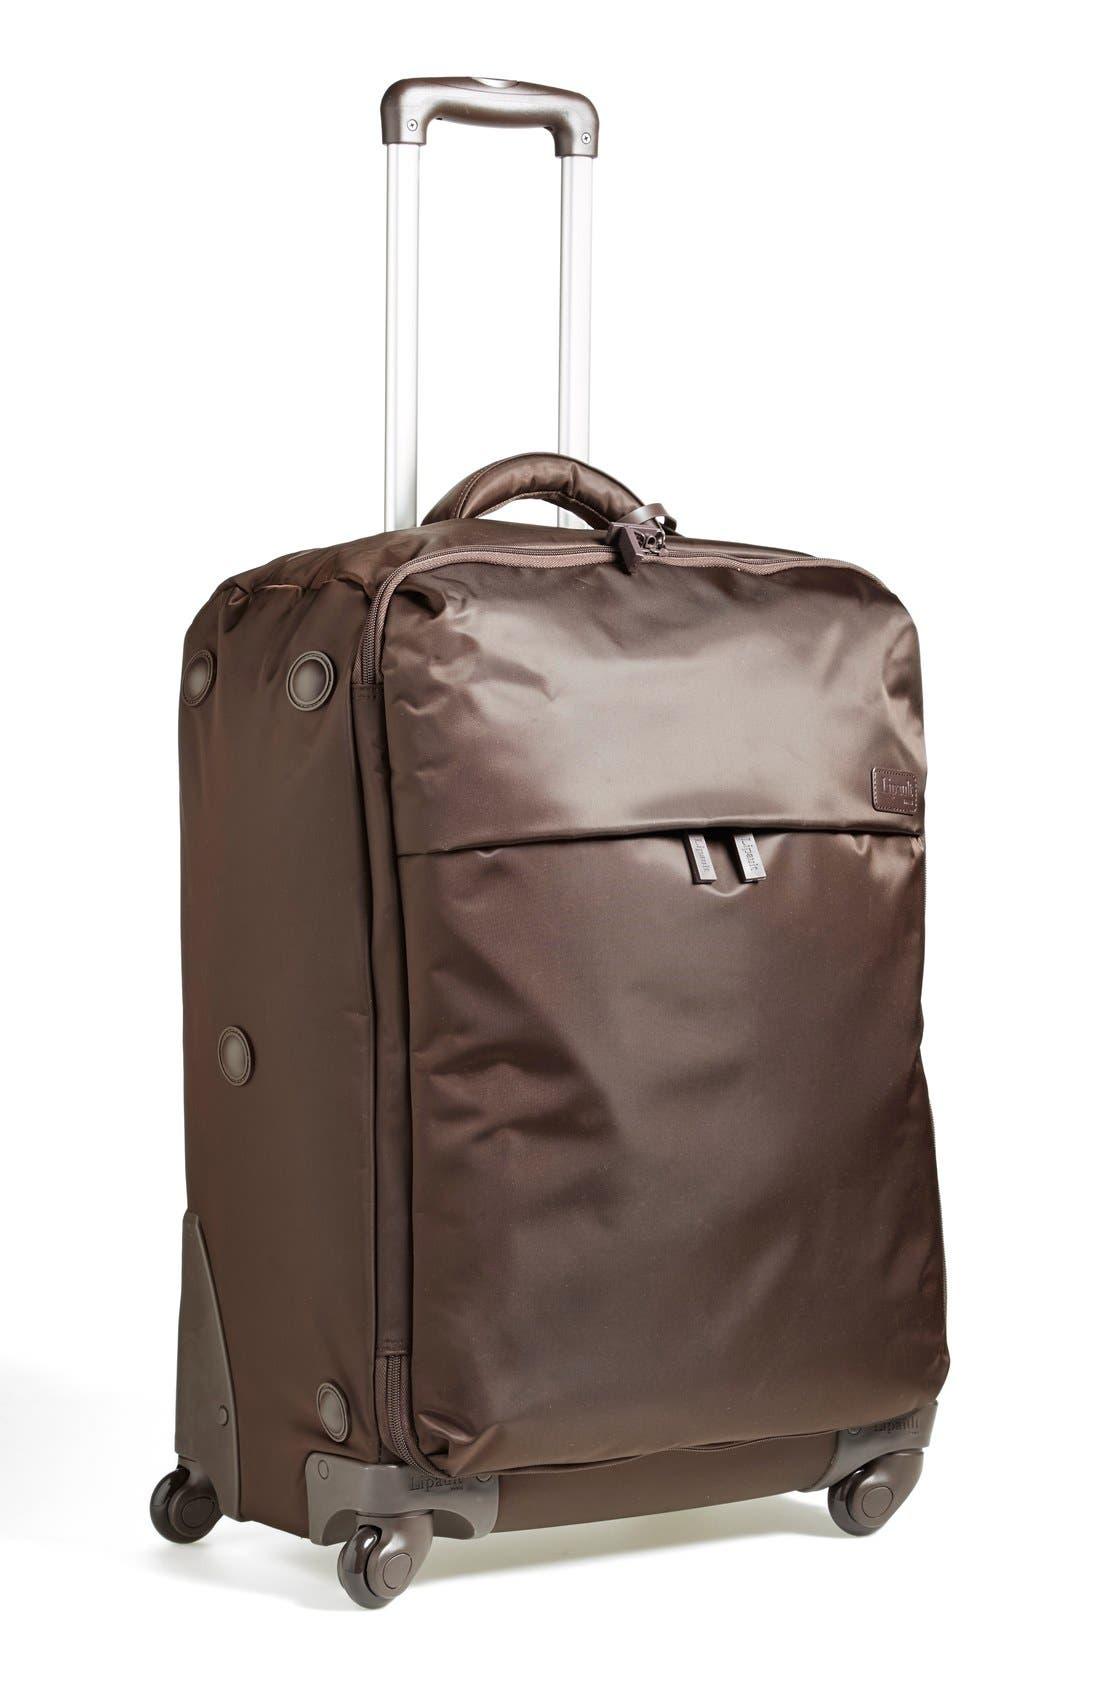 Alternate Image 1 Selected - LIPAULT Paris 4-Wheel Packing Case (25 Inch)